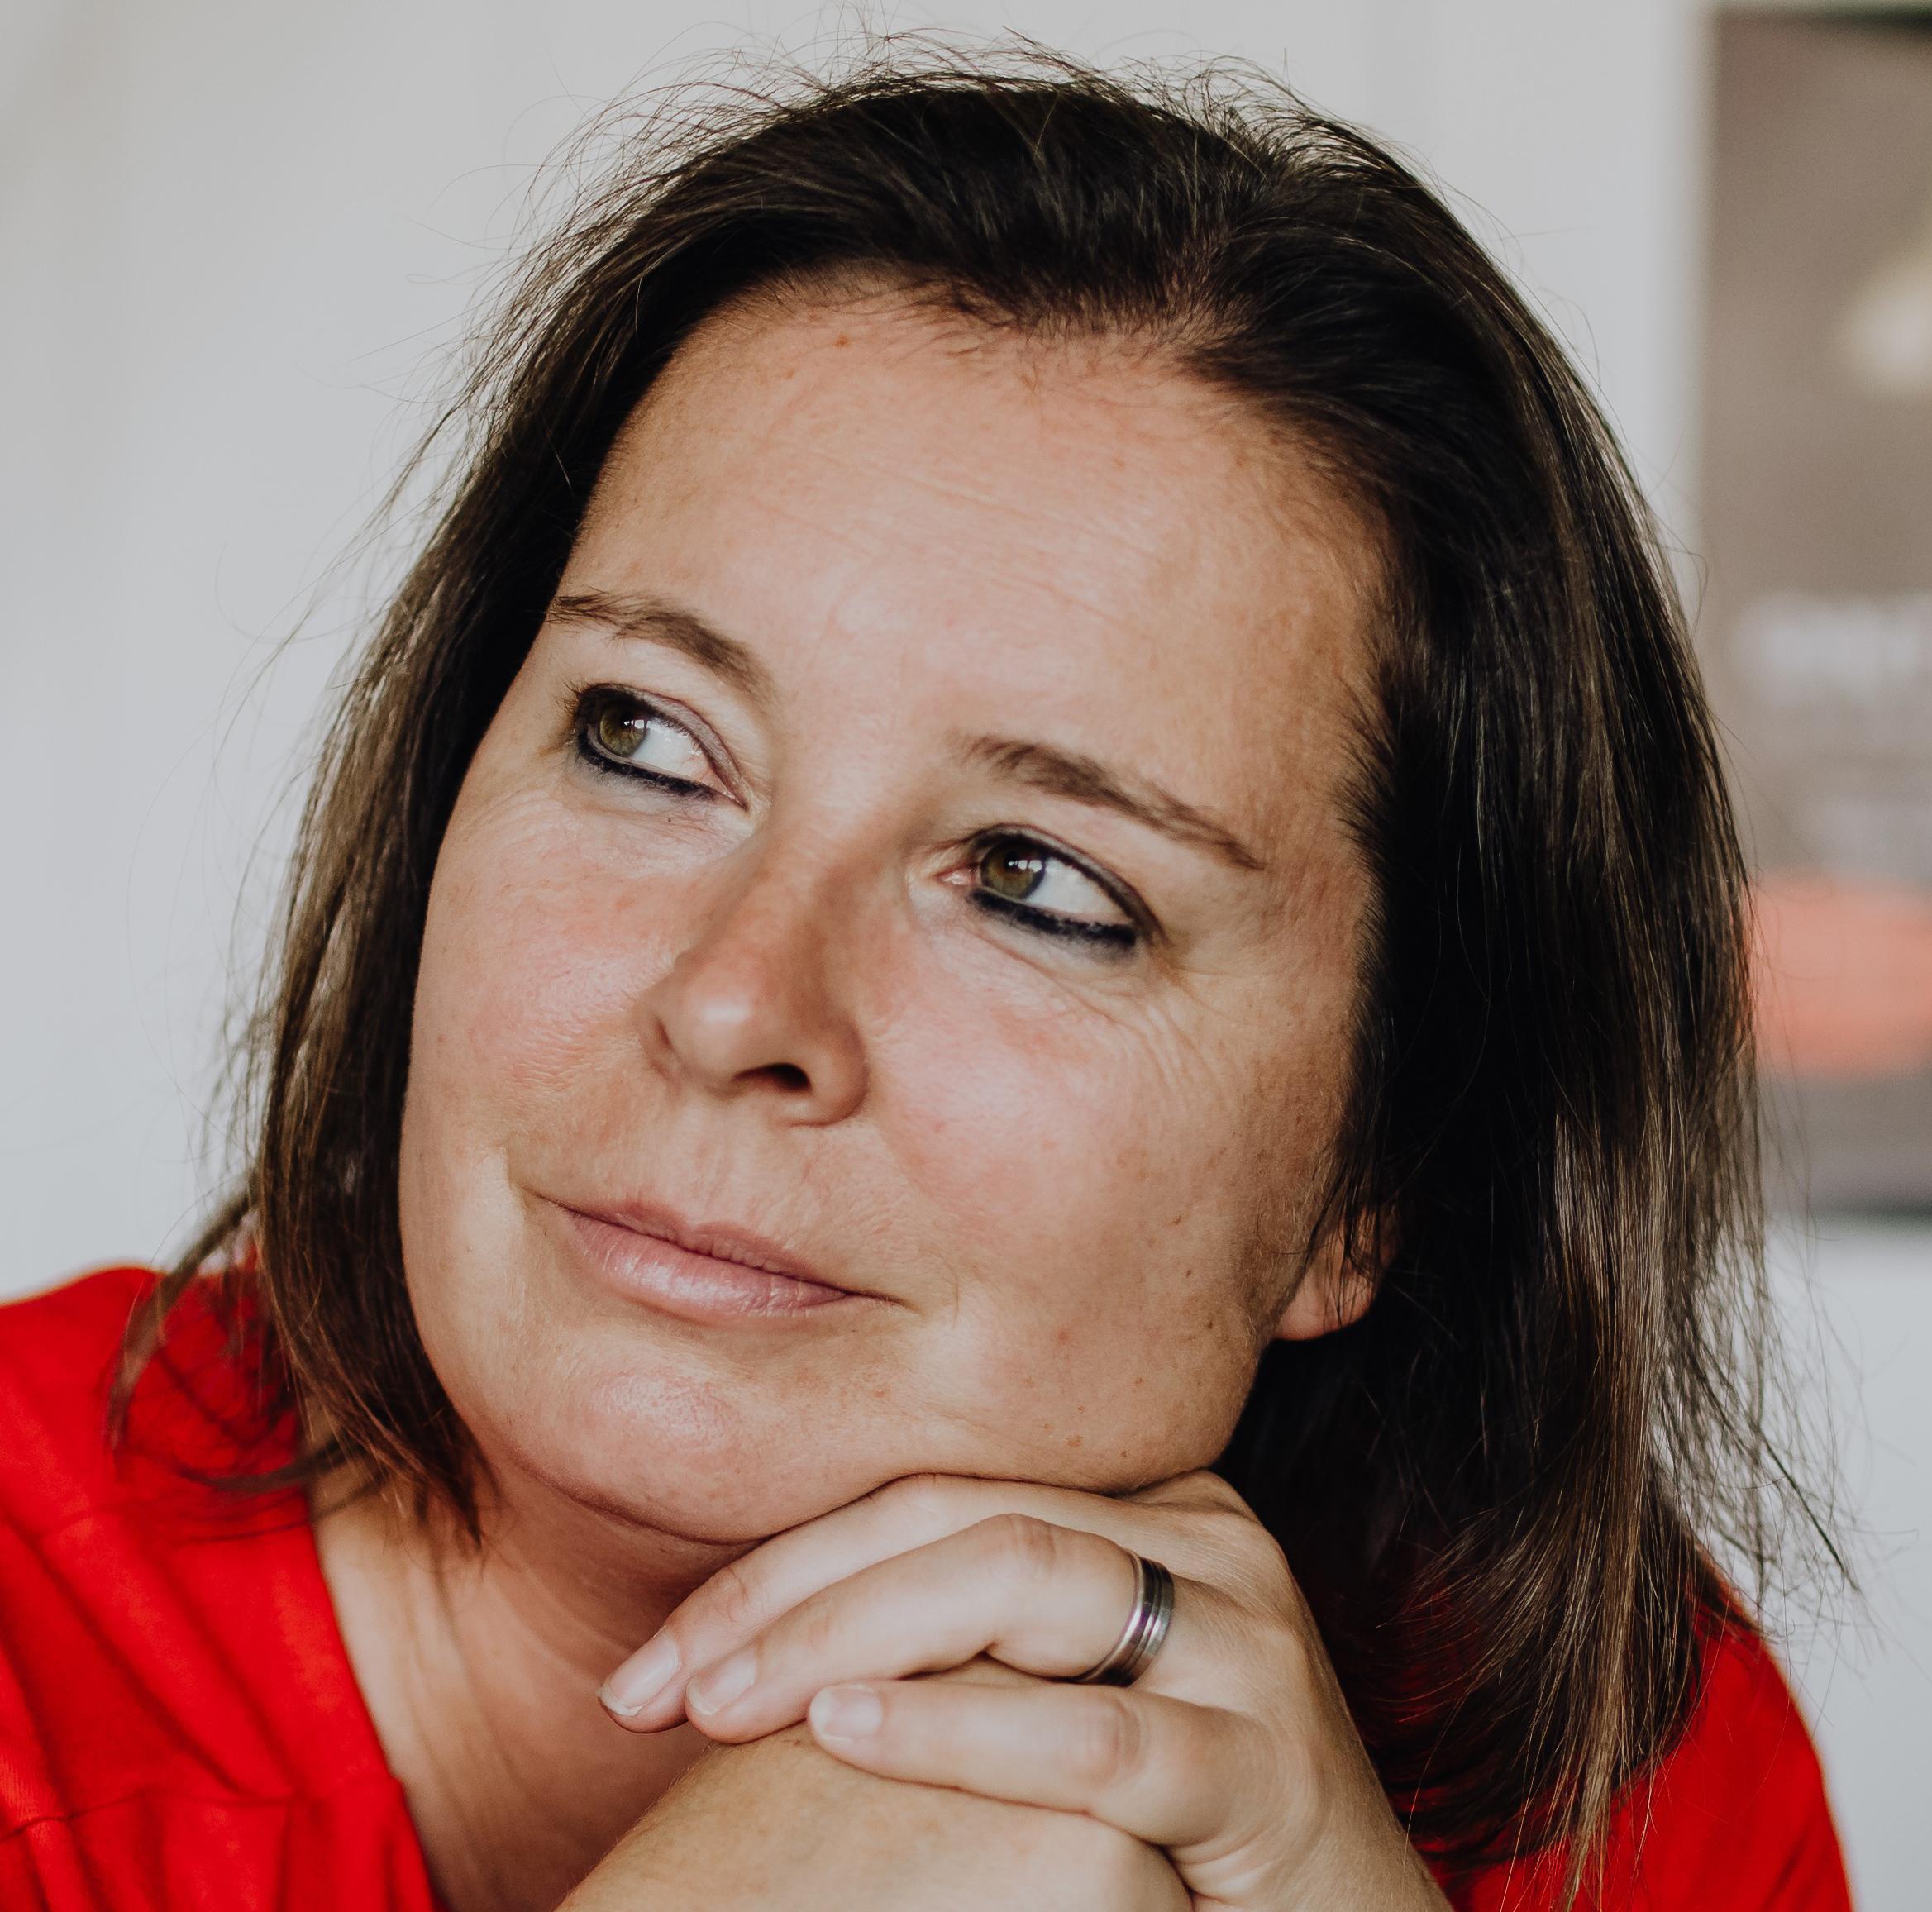 Katrien Bontinck